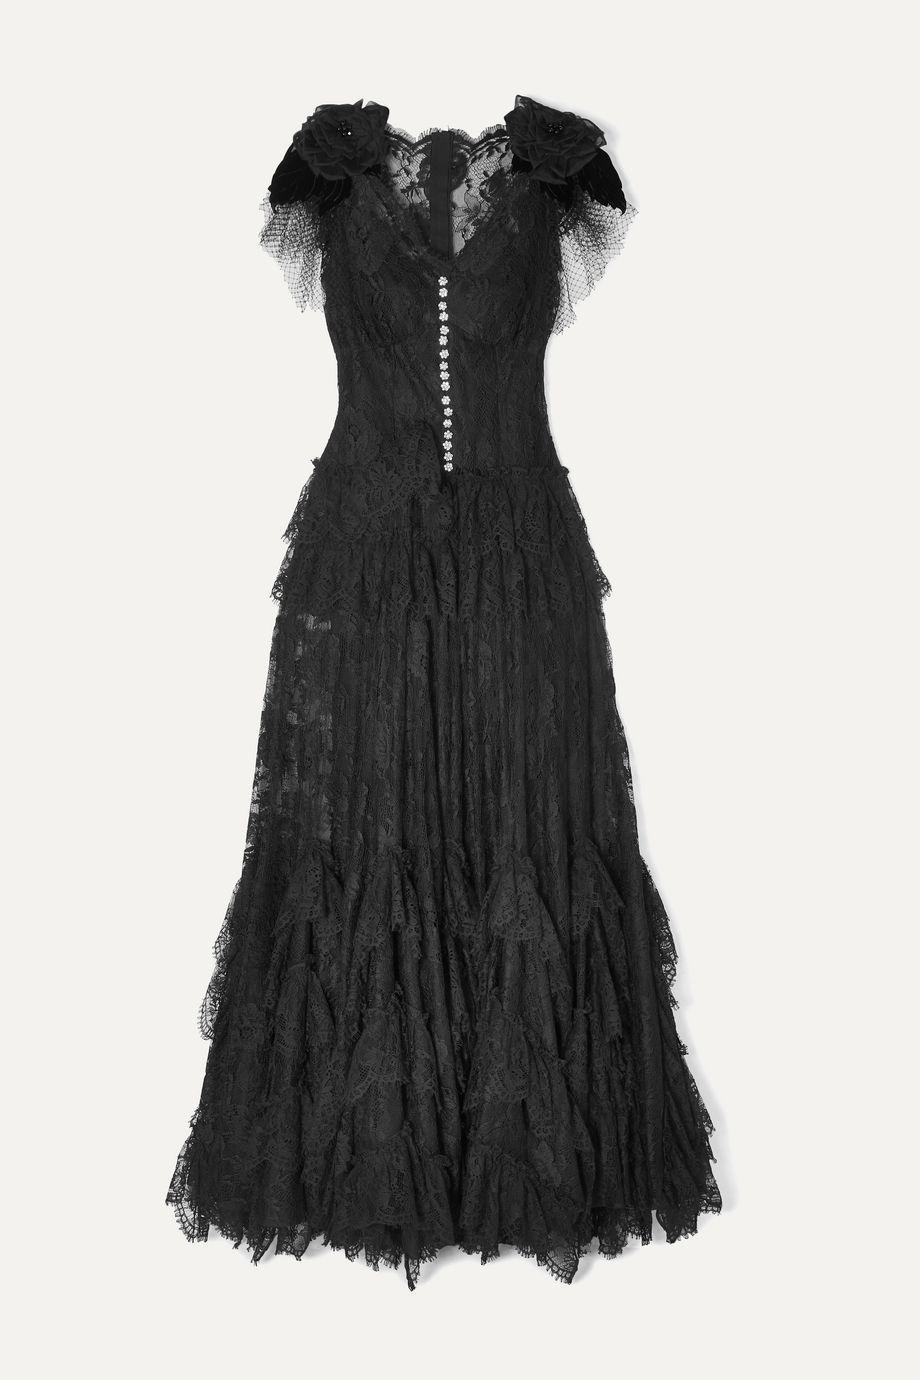 Dolce & Gabbana Appliquéd embellished lace gown